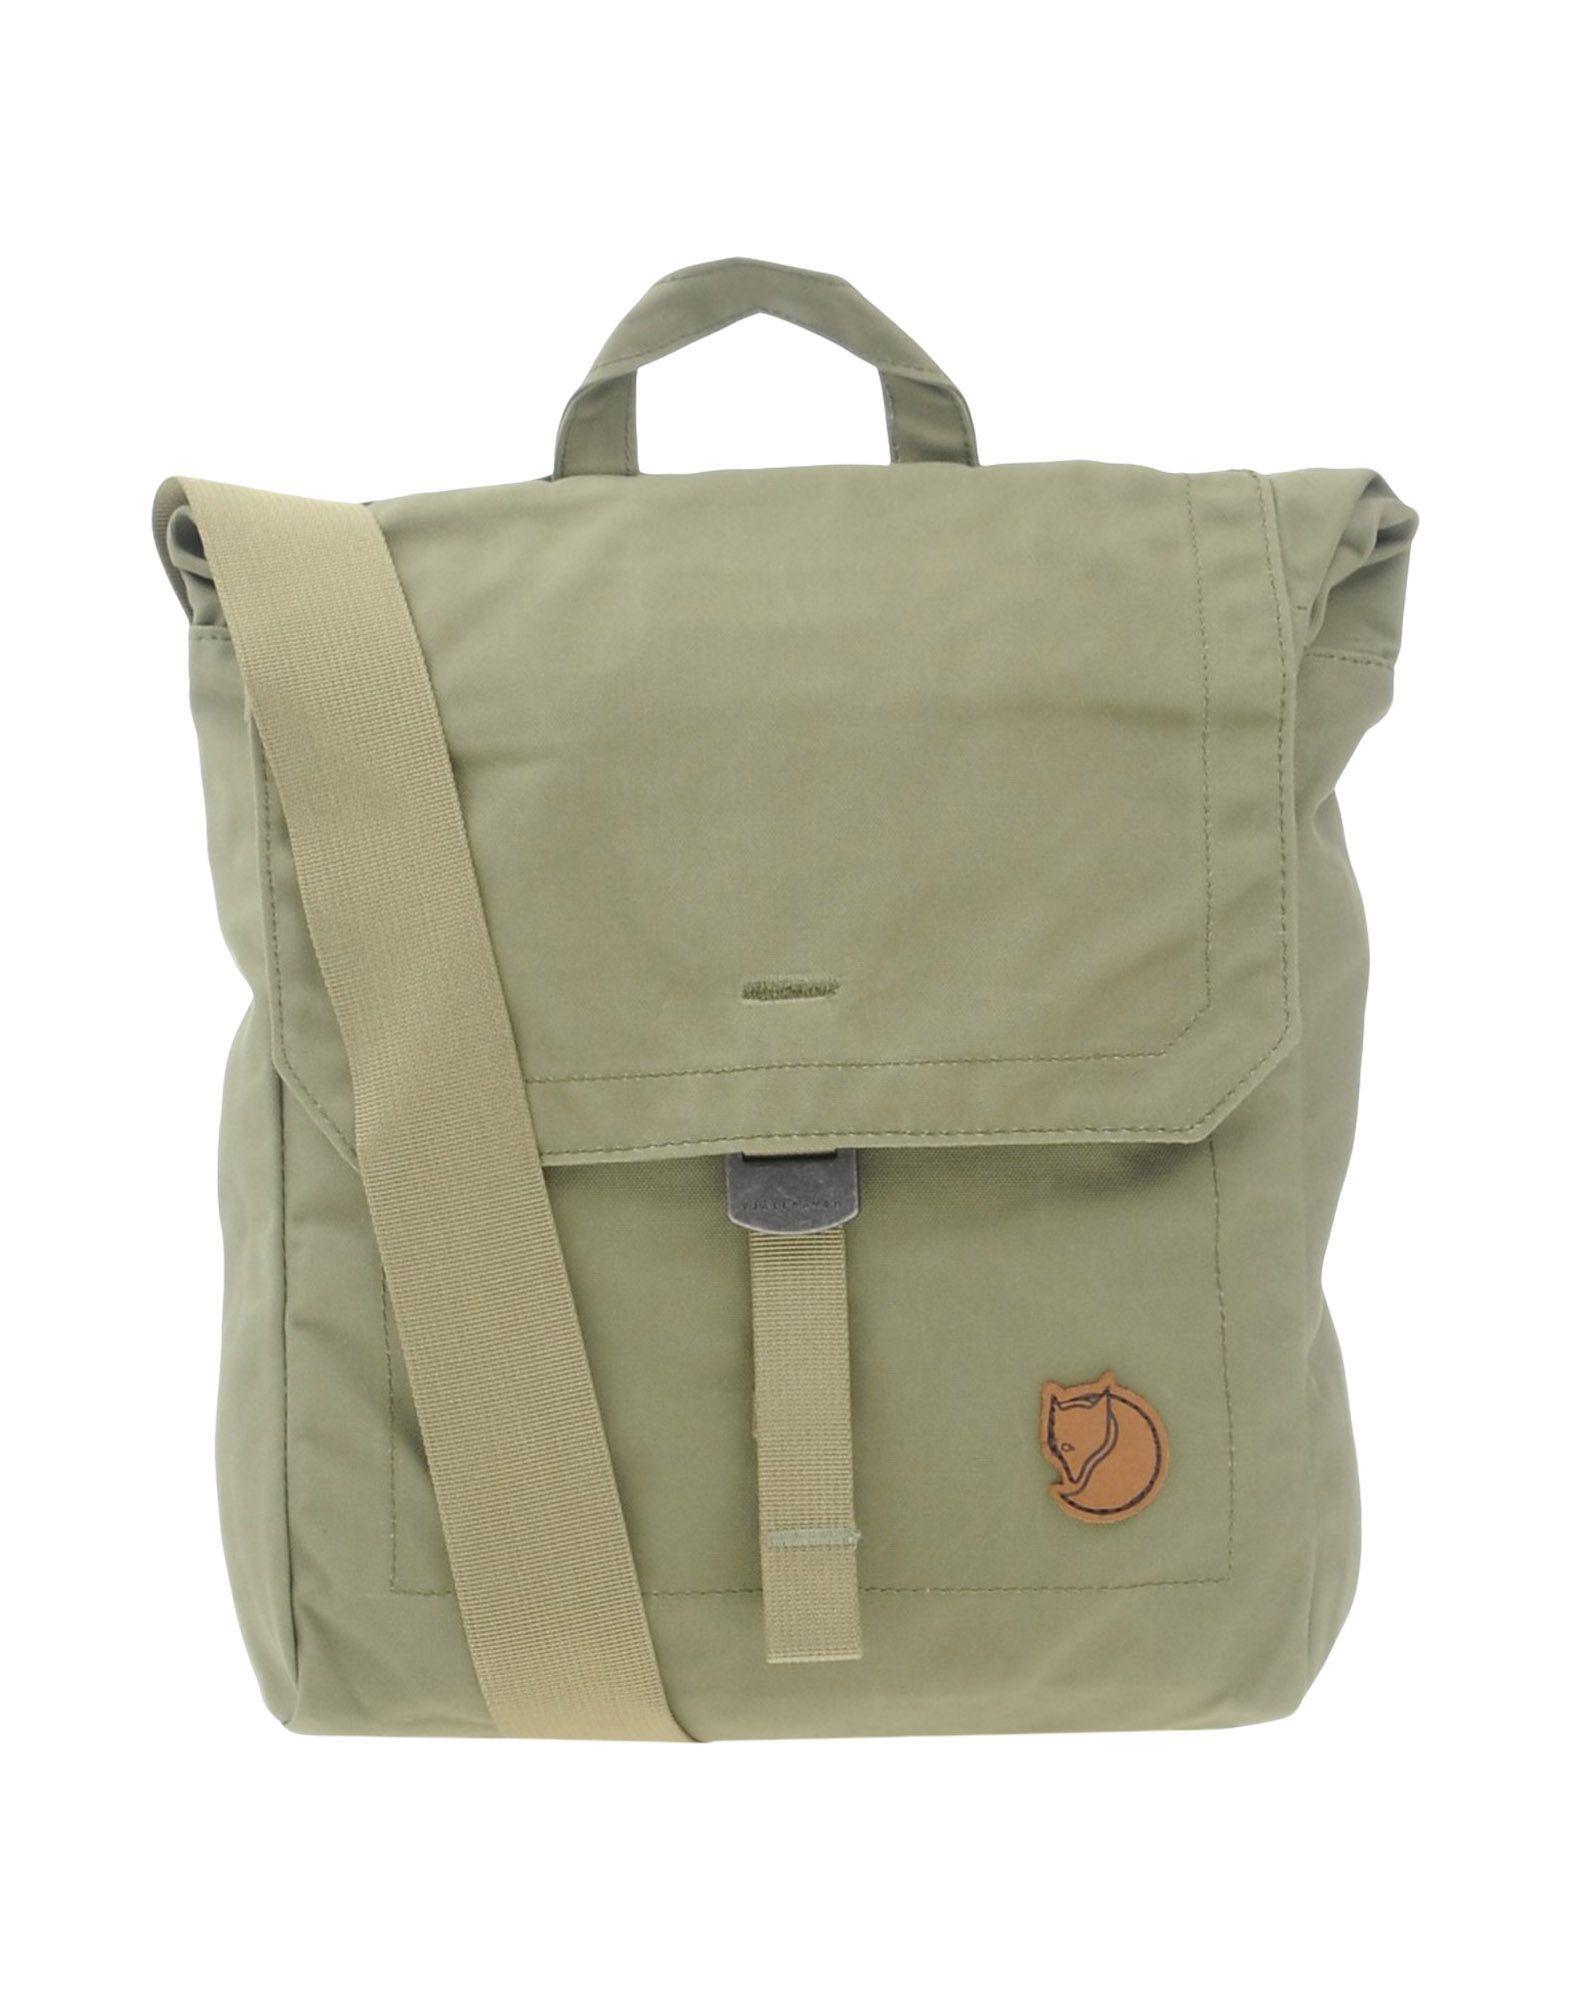 b445ed4451 FJALL RAVEN Across-body bag.  fjallraven  bags  shoulder bags  hand bags   polyester  cotton